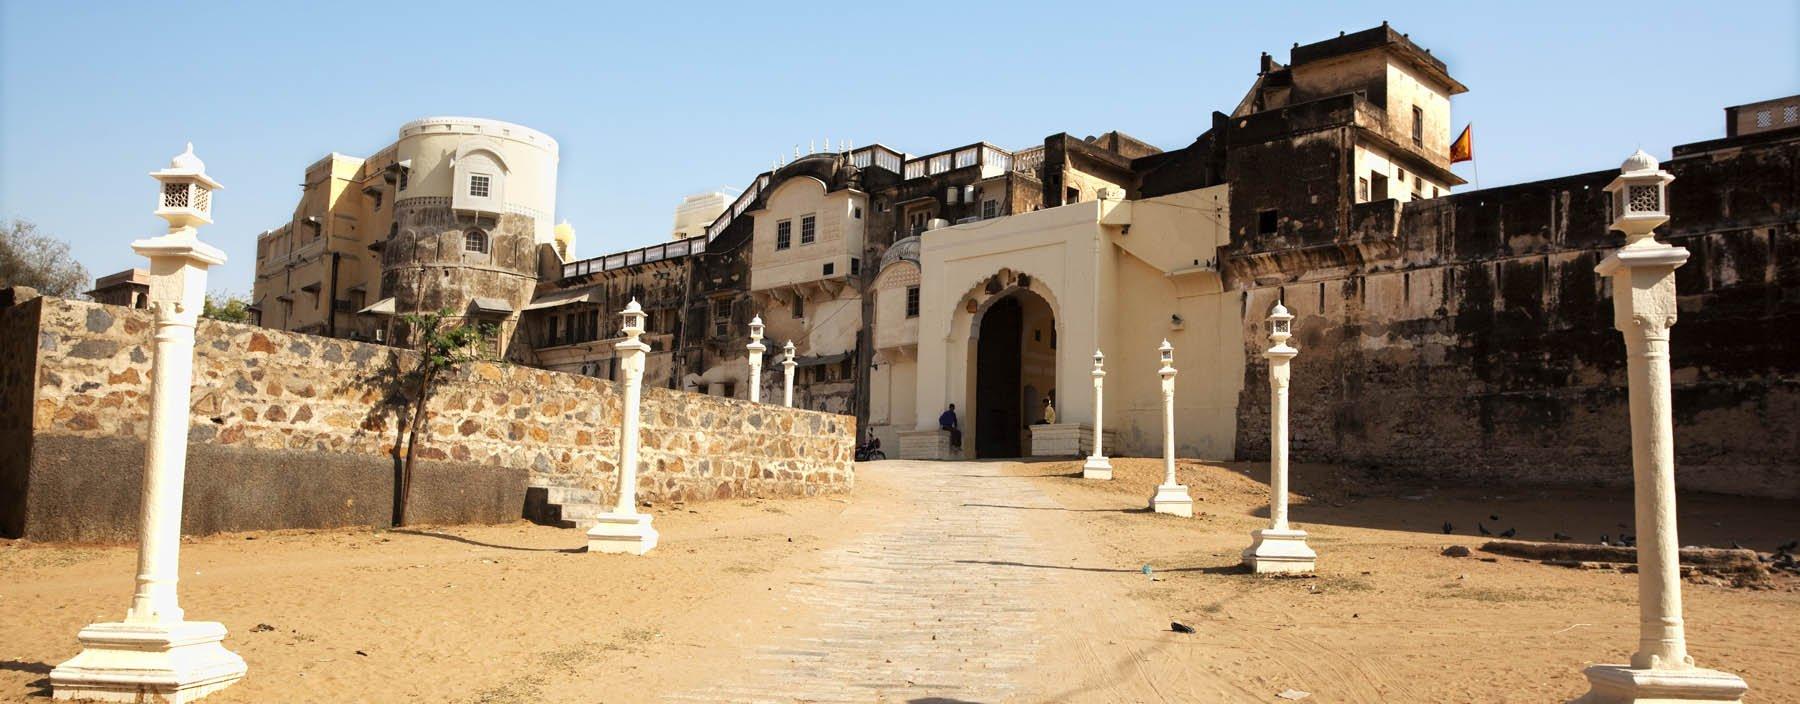 in, mandawa, fort of mandawa.jpg